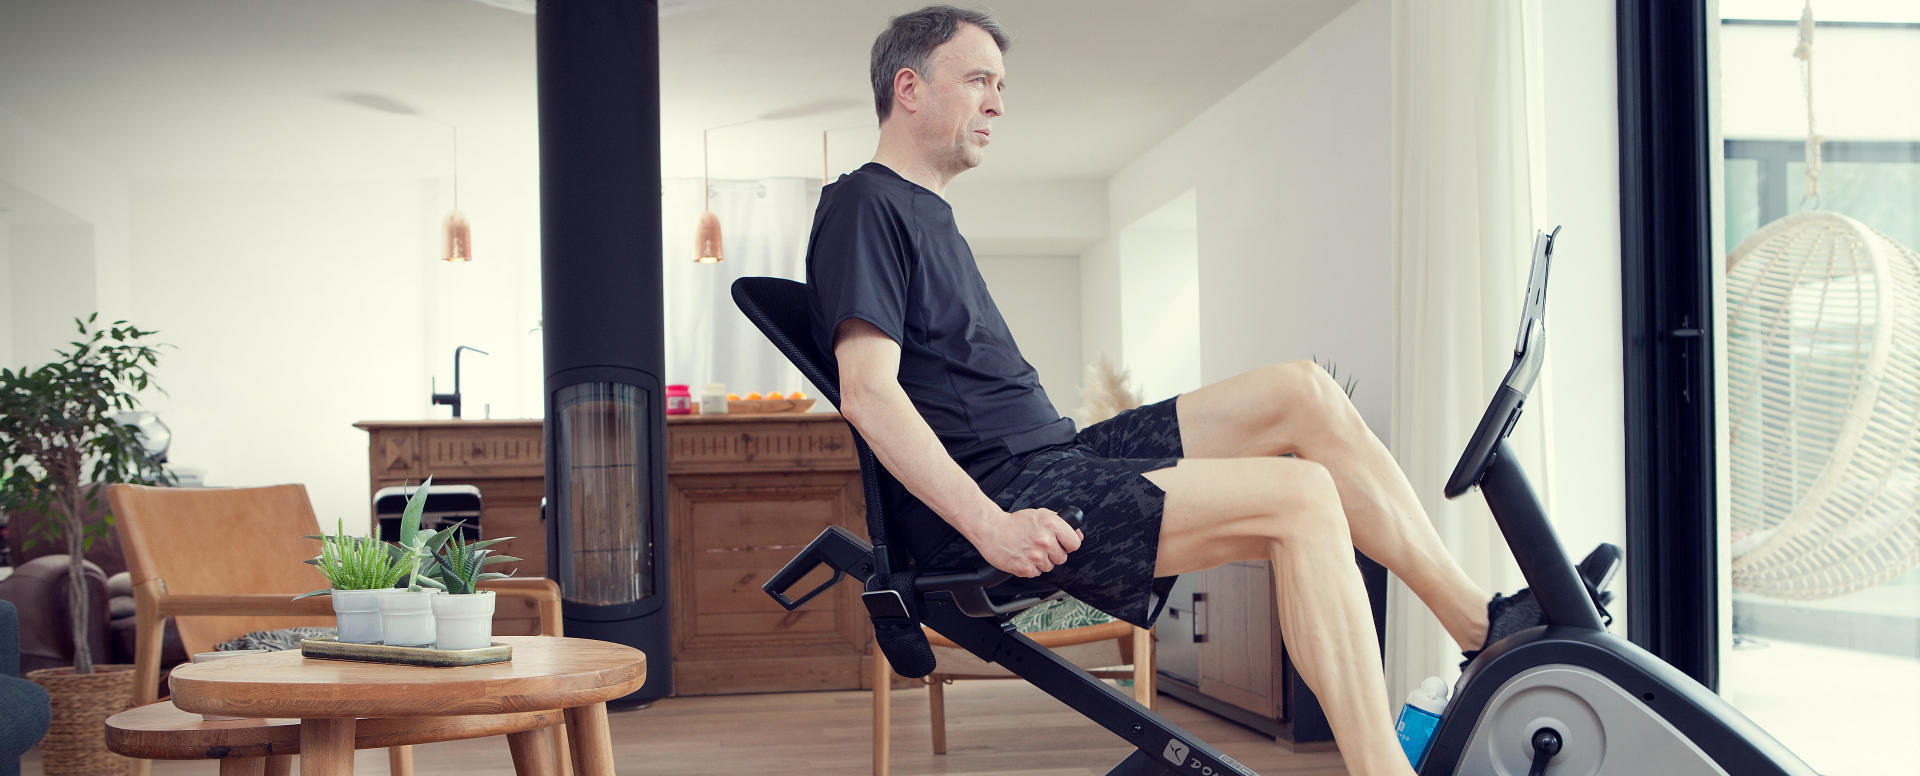 Leg Workouts - 33 Must Try Leg Workouts - Decathlon